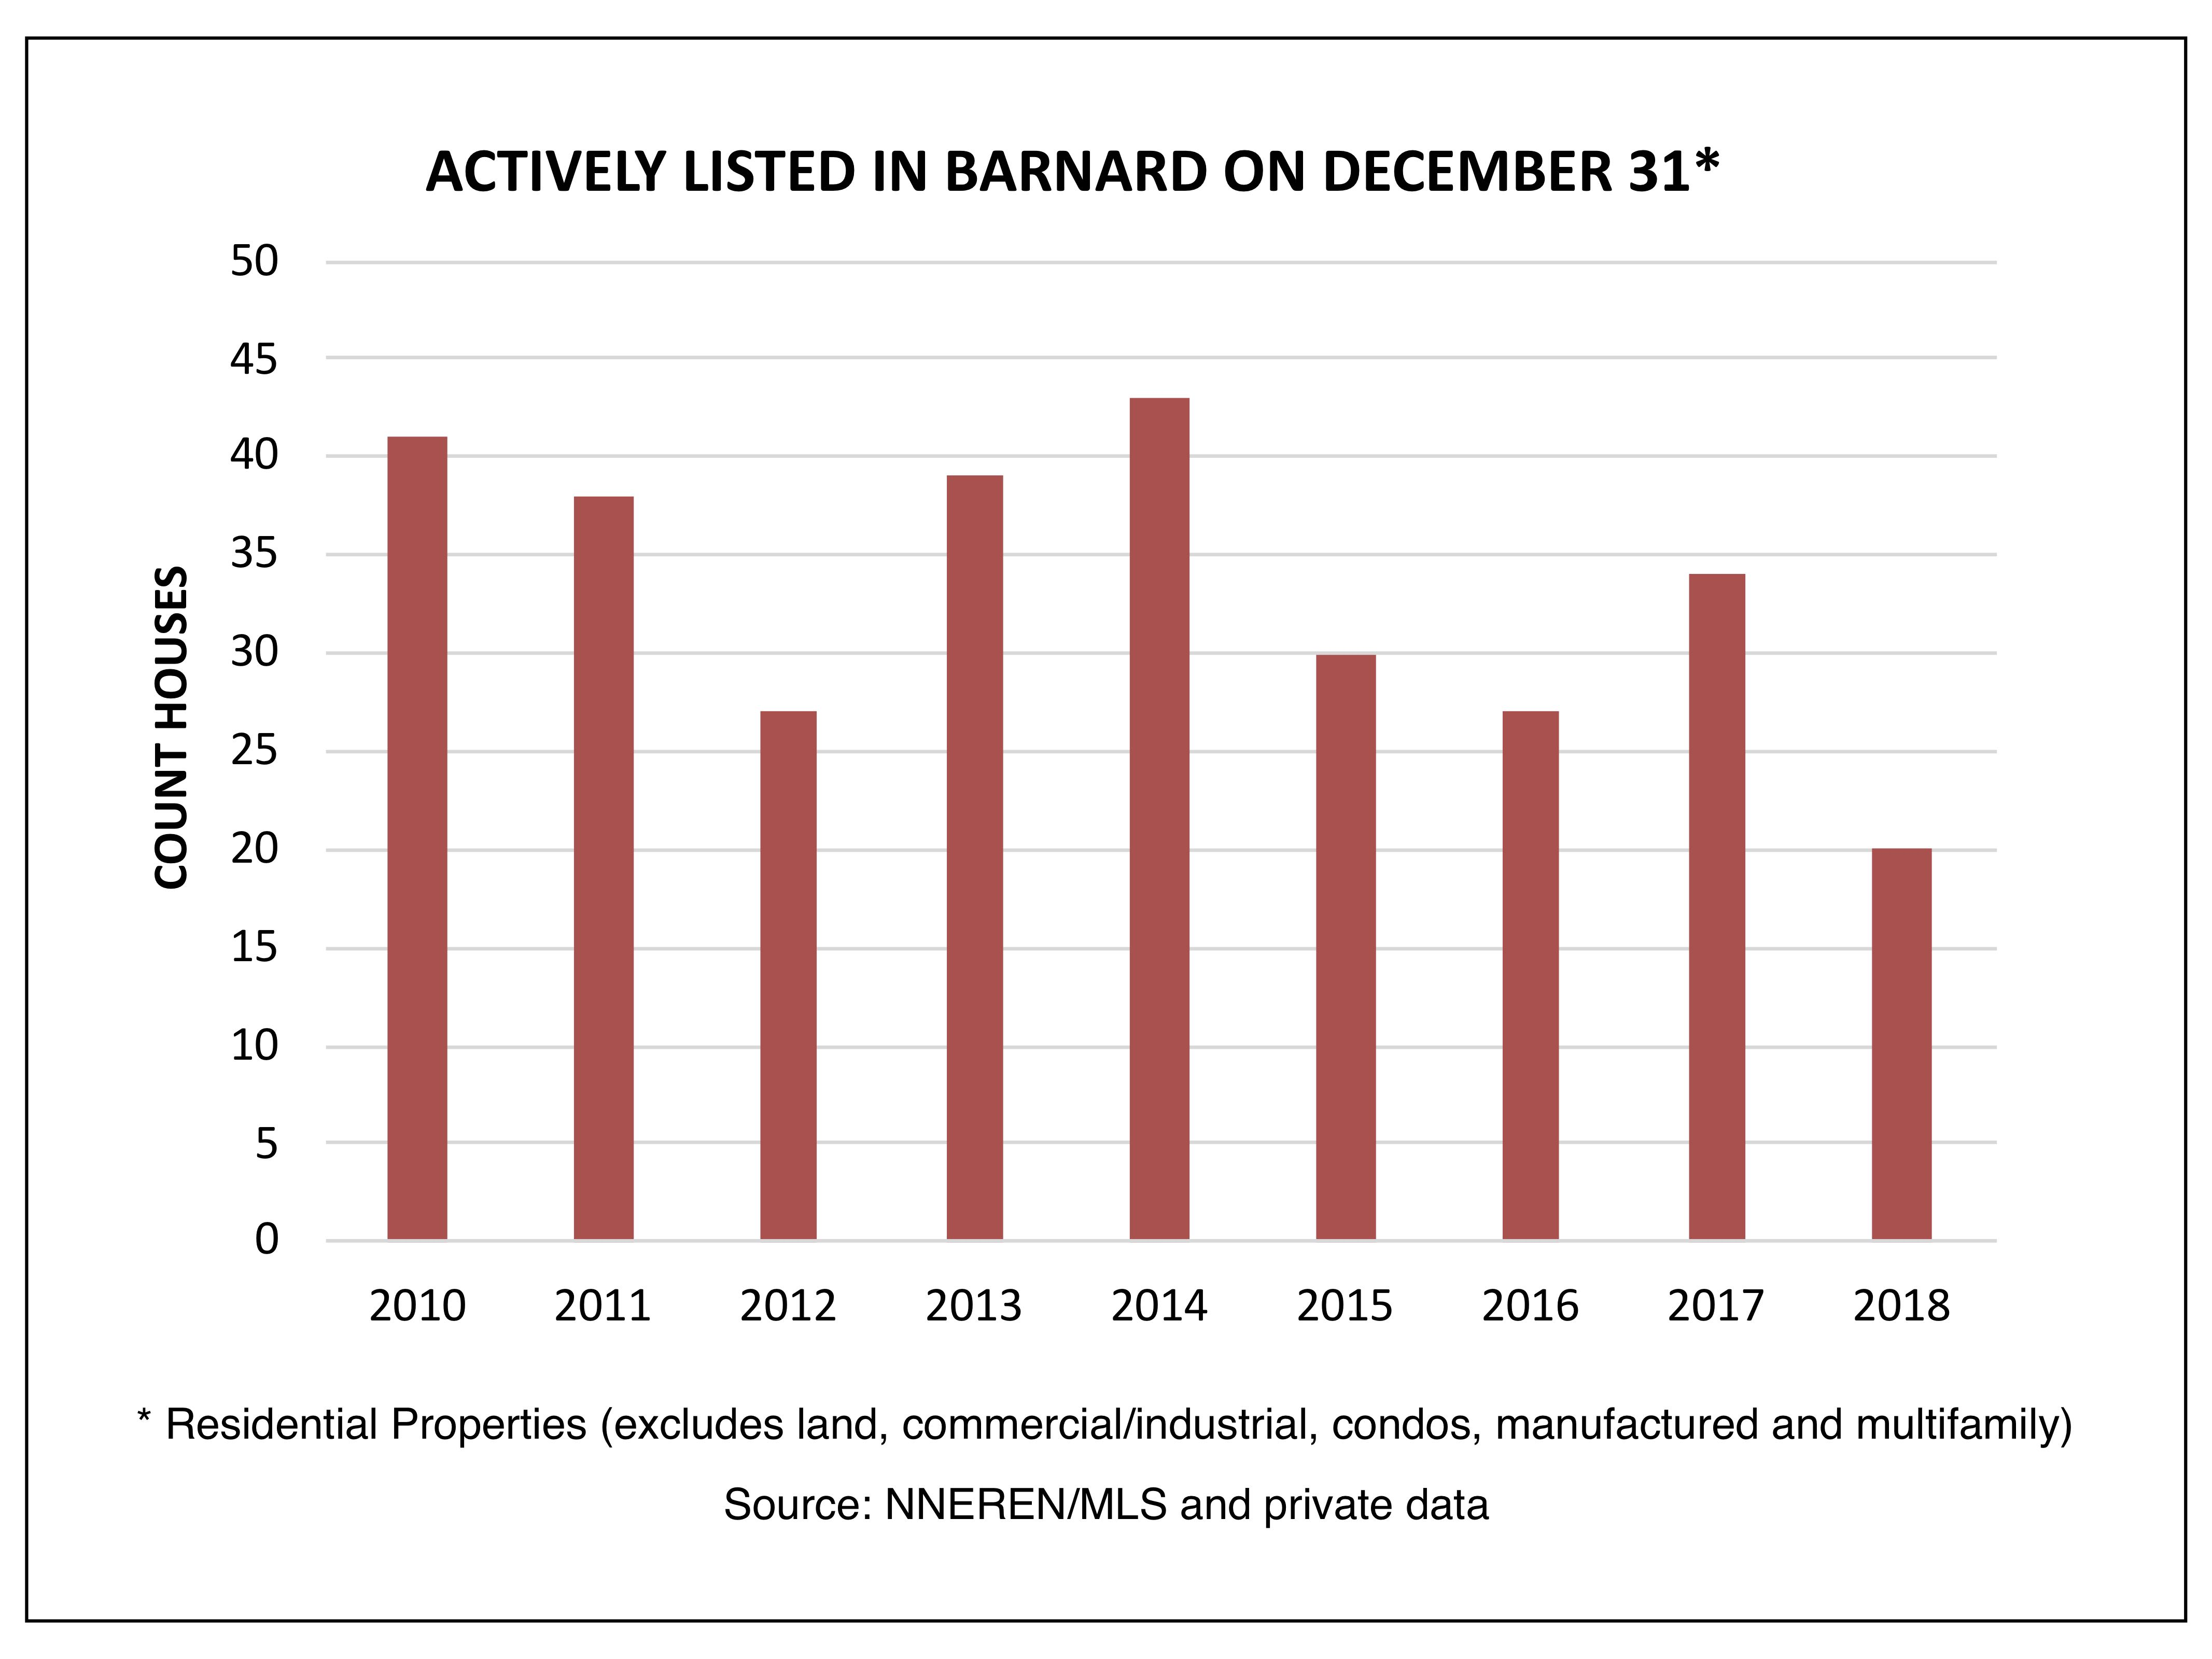 Barnard - Actively Listed on December 31